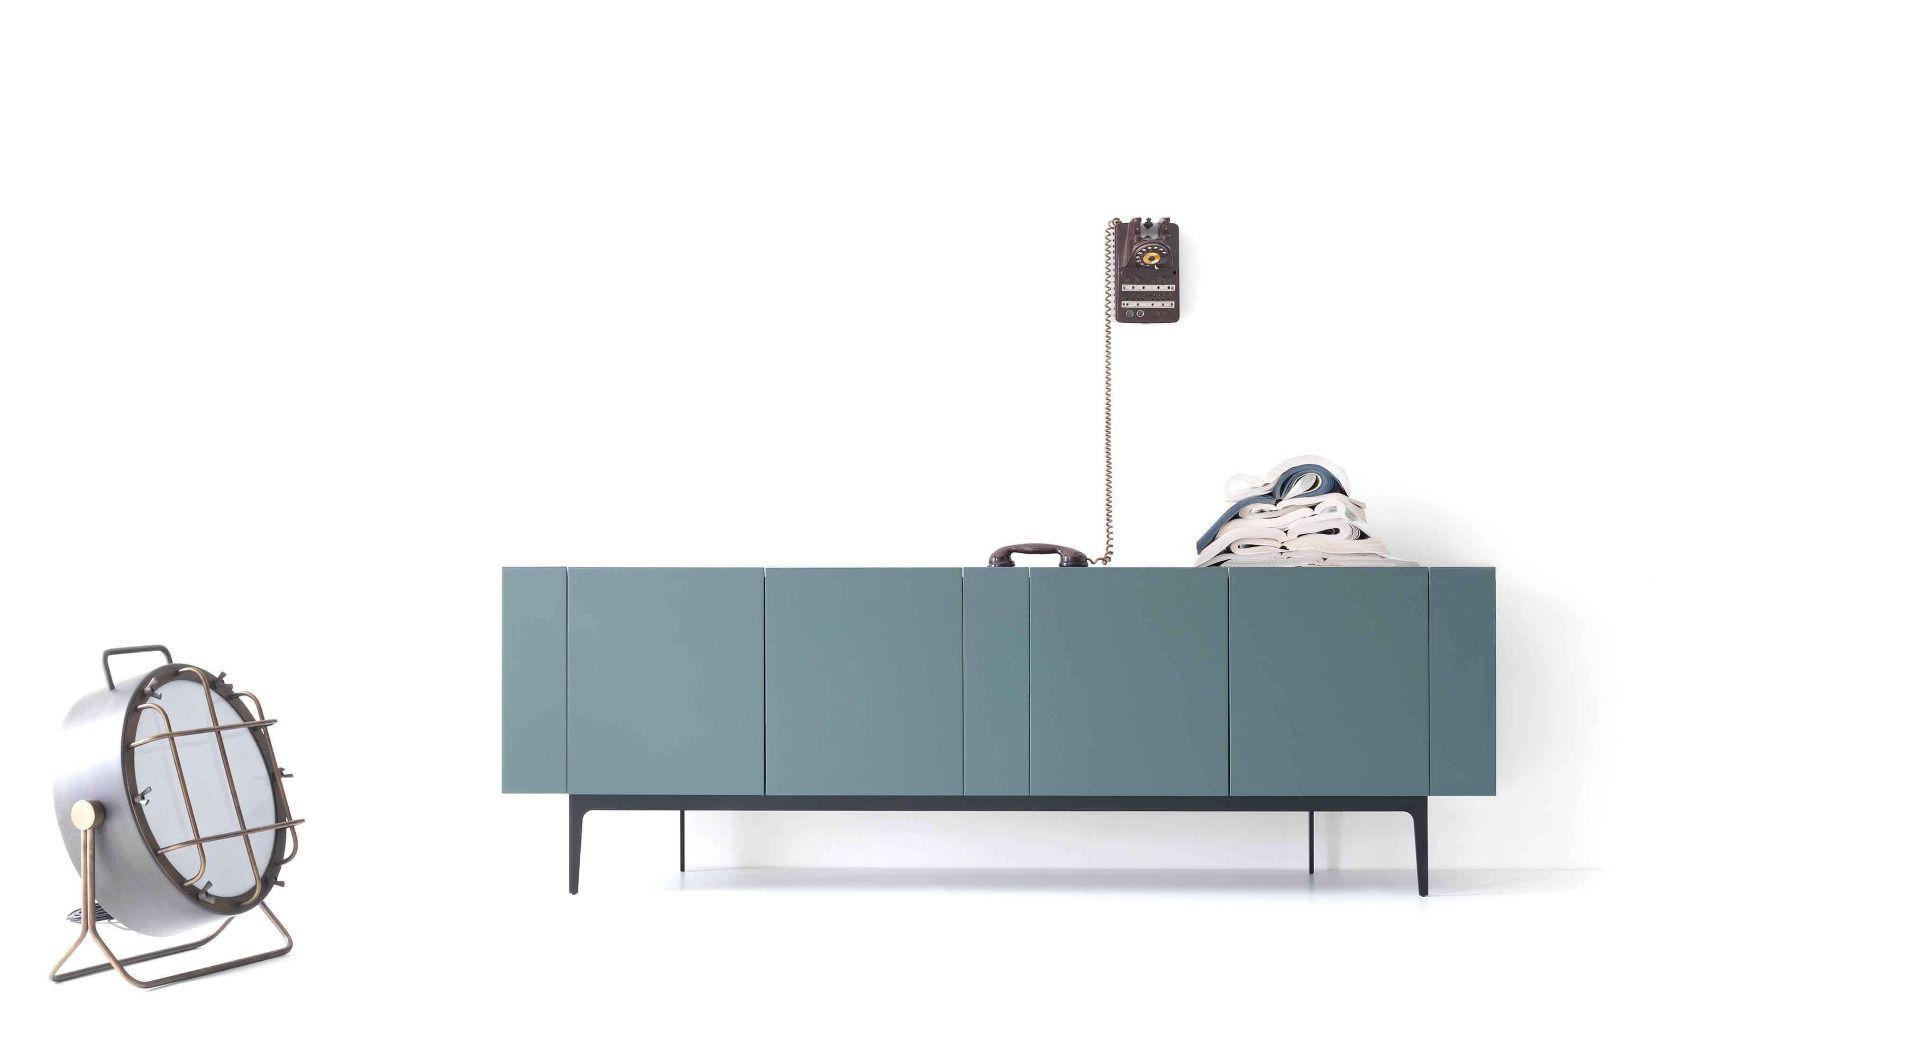 Rainbow Madia Con Ante Laccate Colorate Lema Sideboard Hochwertige Möbel Hersteller